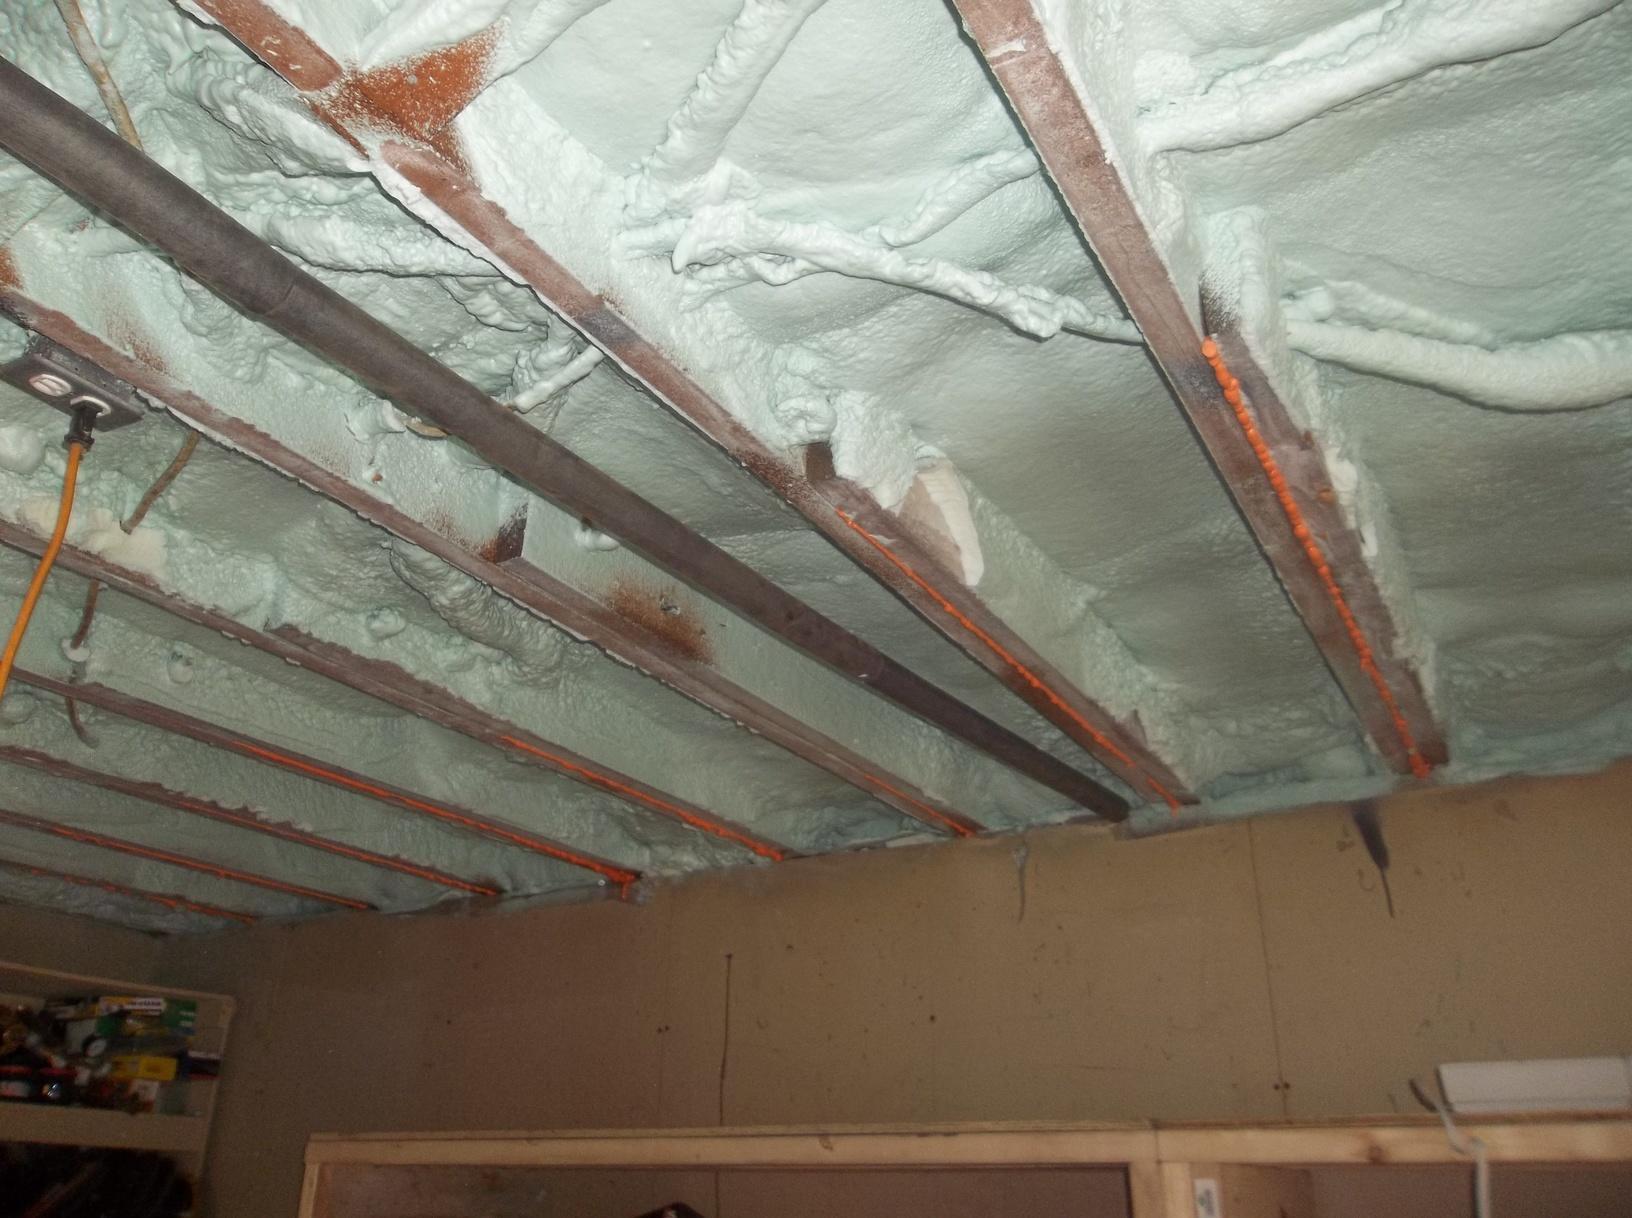 Garage Ceiling Insulated with Spray Foam